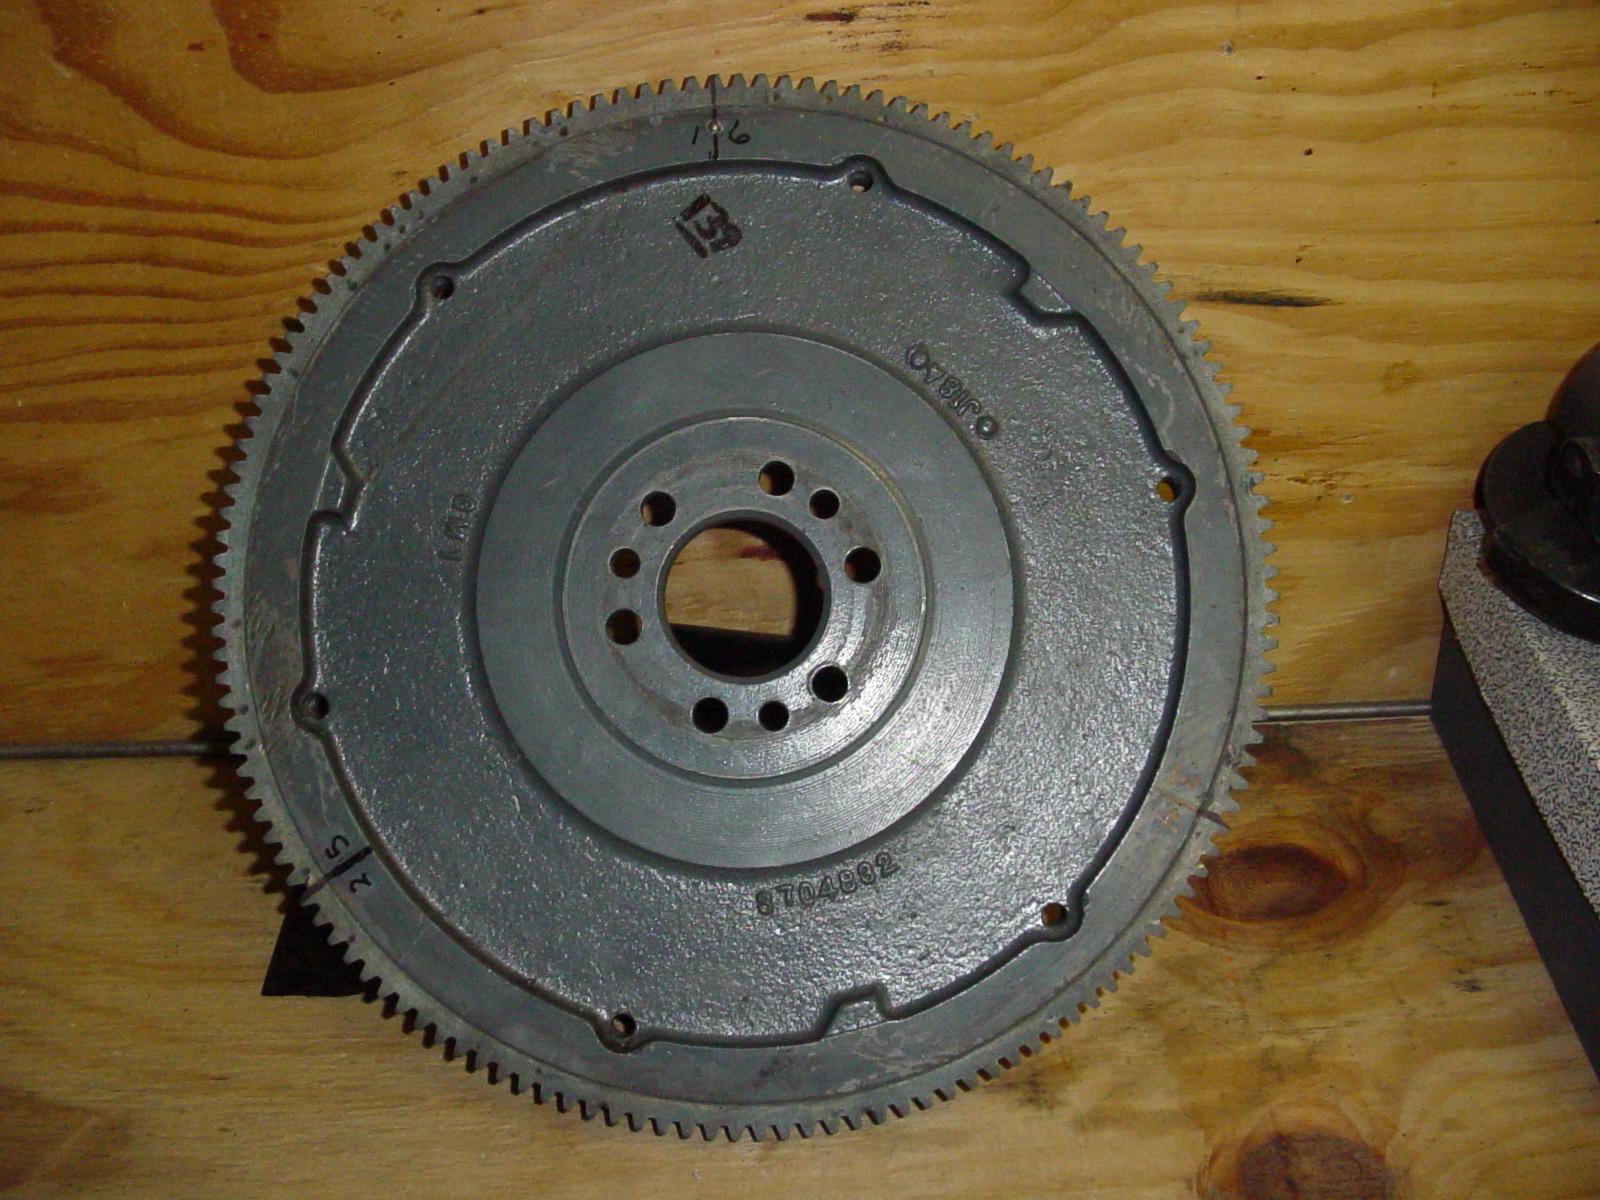 6 Volt Vs 12 Volt Flywheels Explained Chevy Truck Clutch Linkage Diagram  1948 Chevy 216 Clutch Diagram